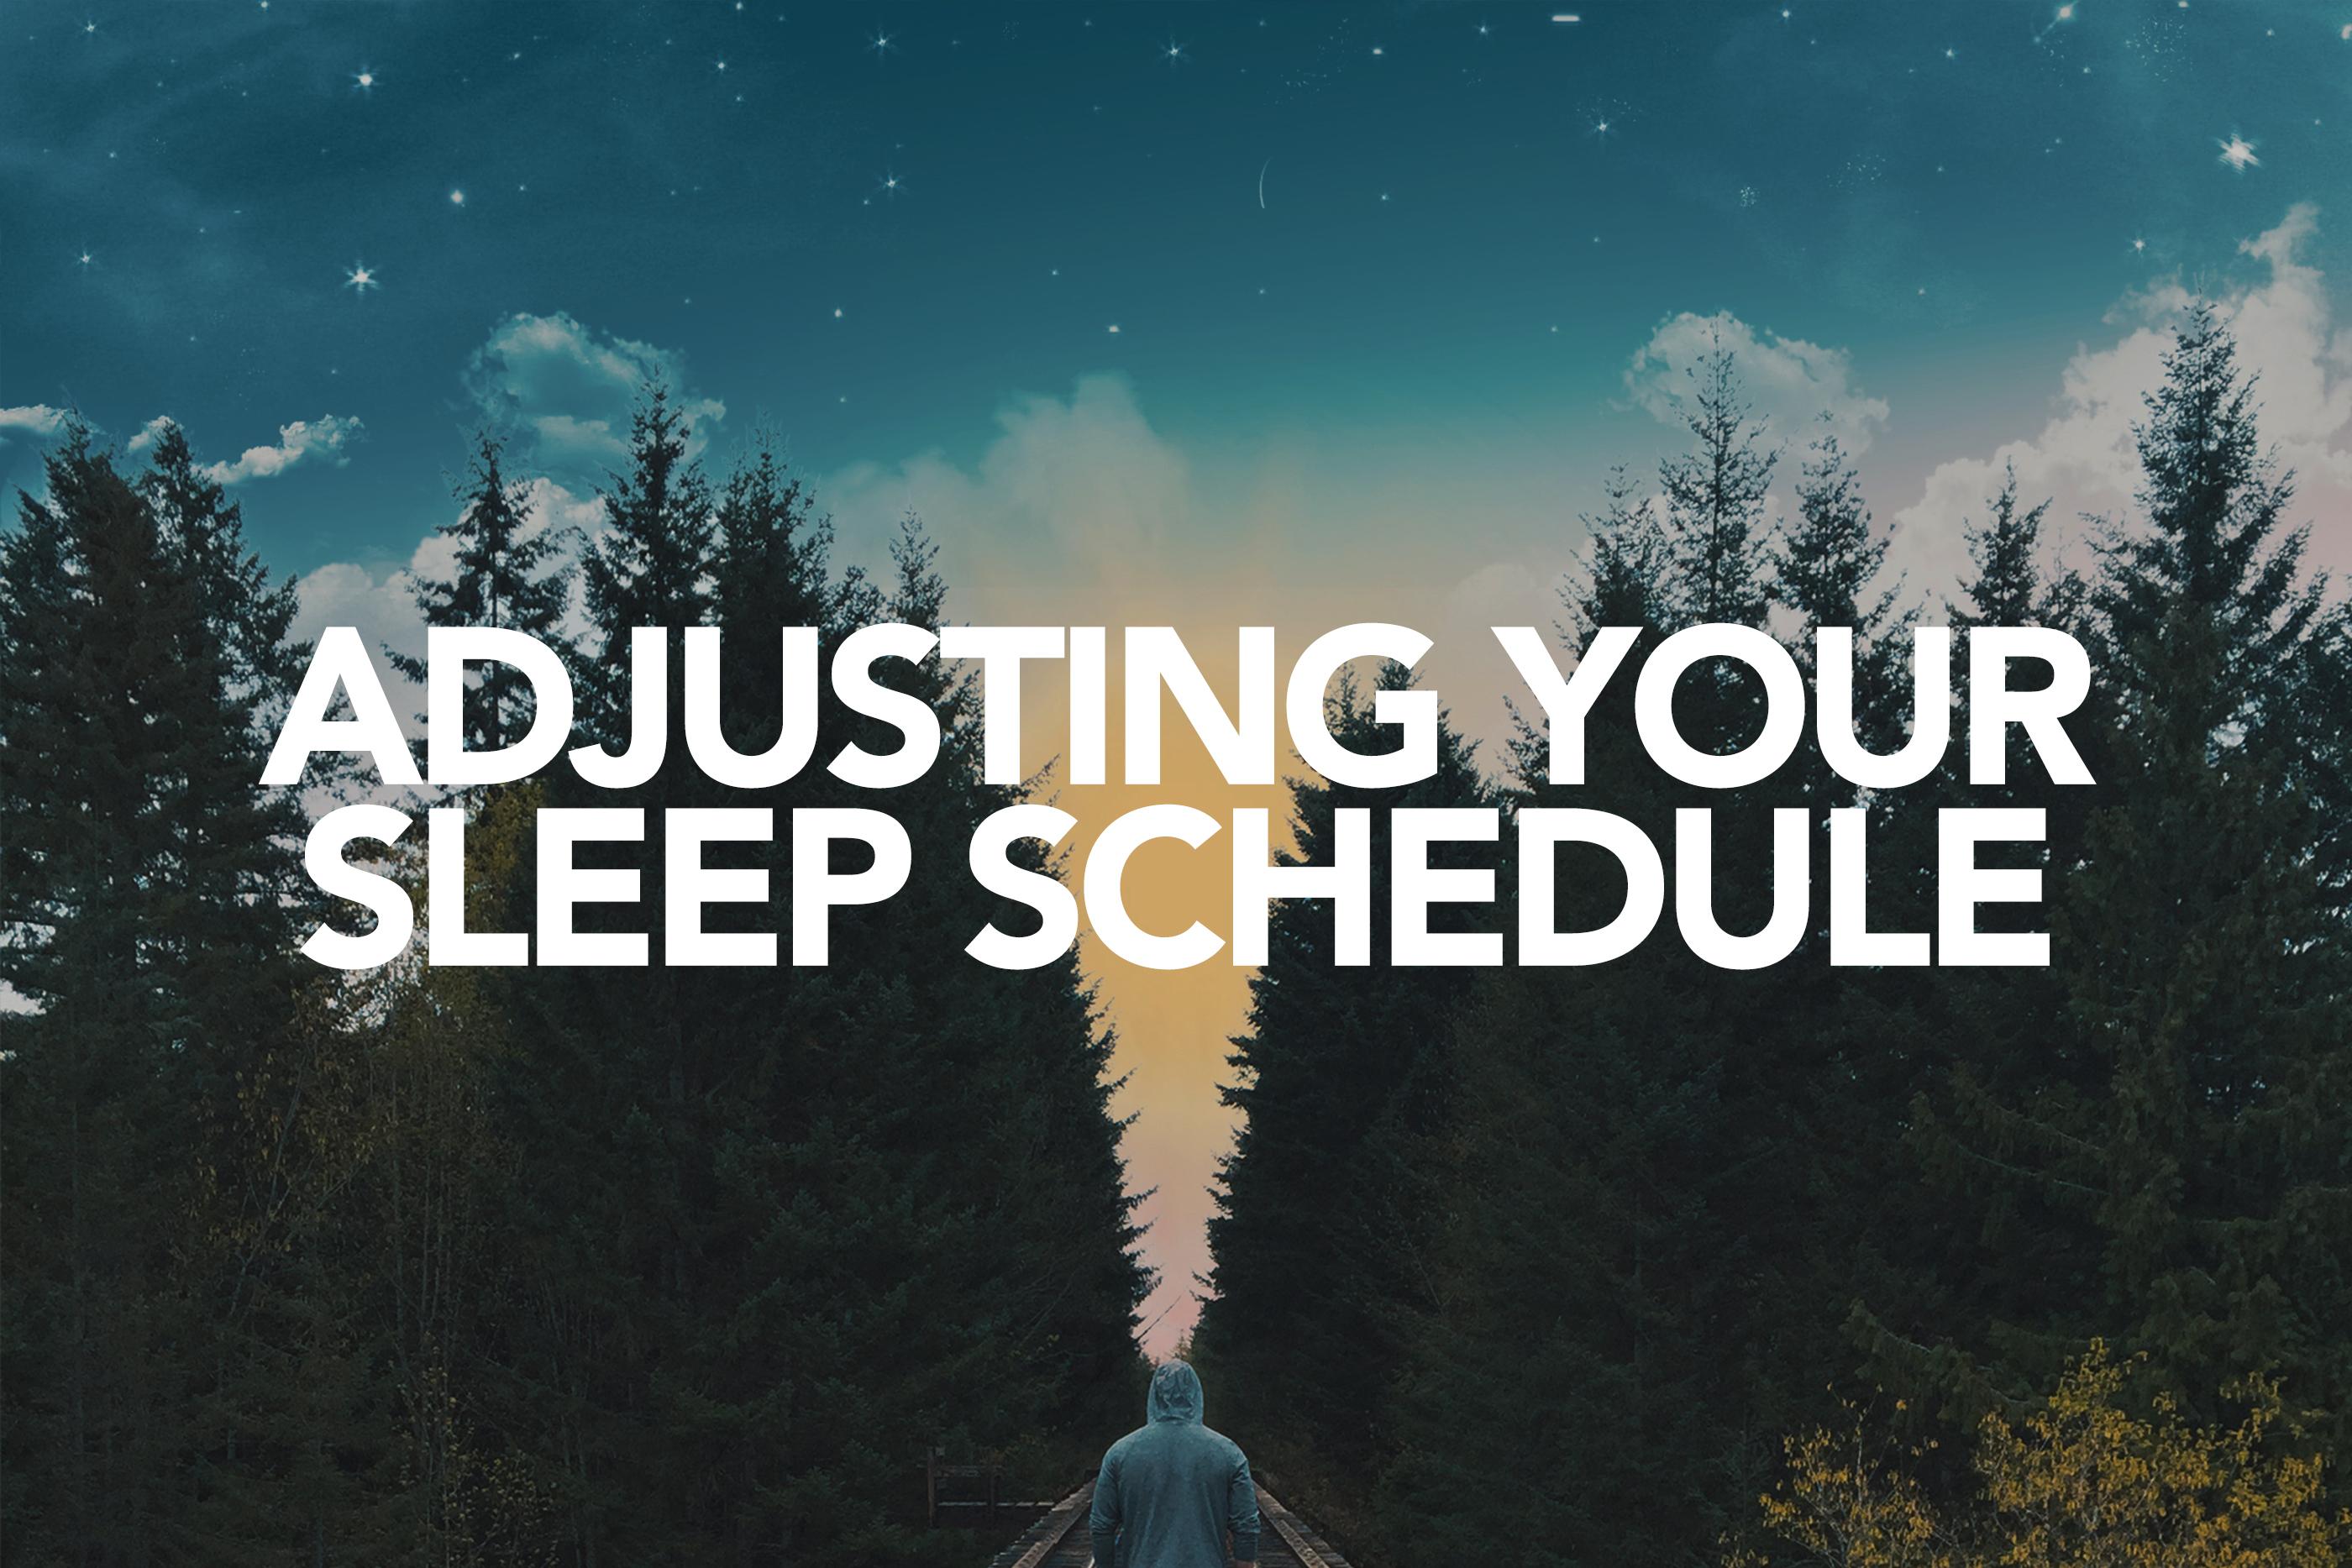 ADJUSTING SLEEP ROUTINES